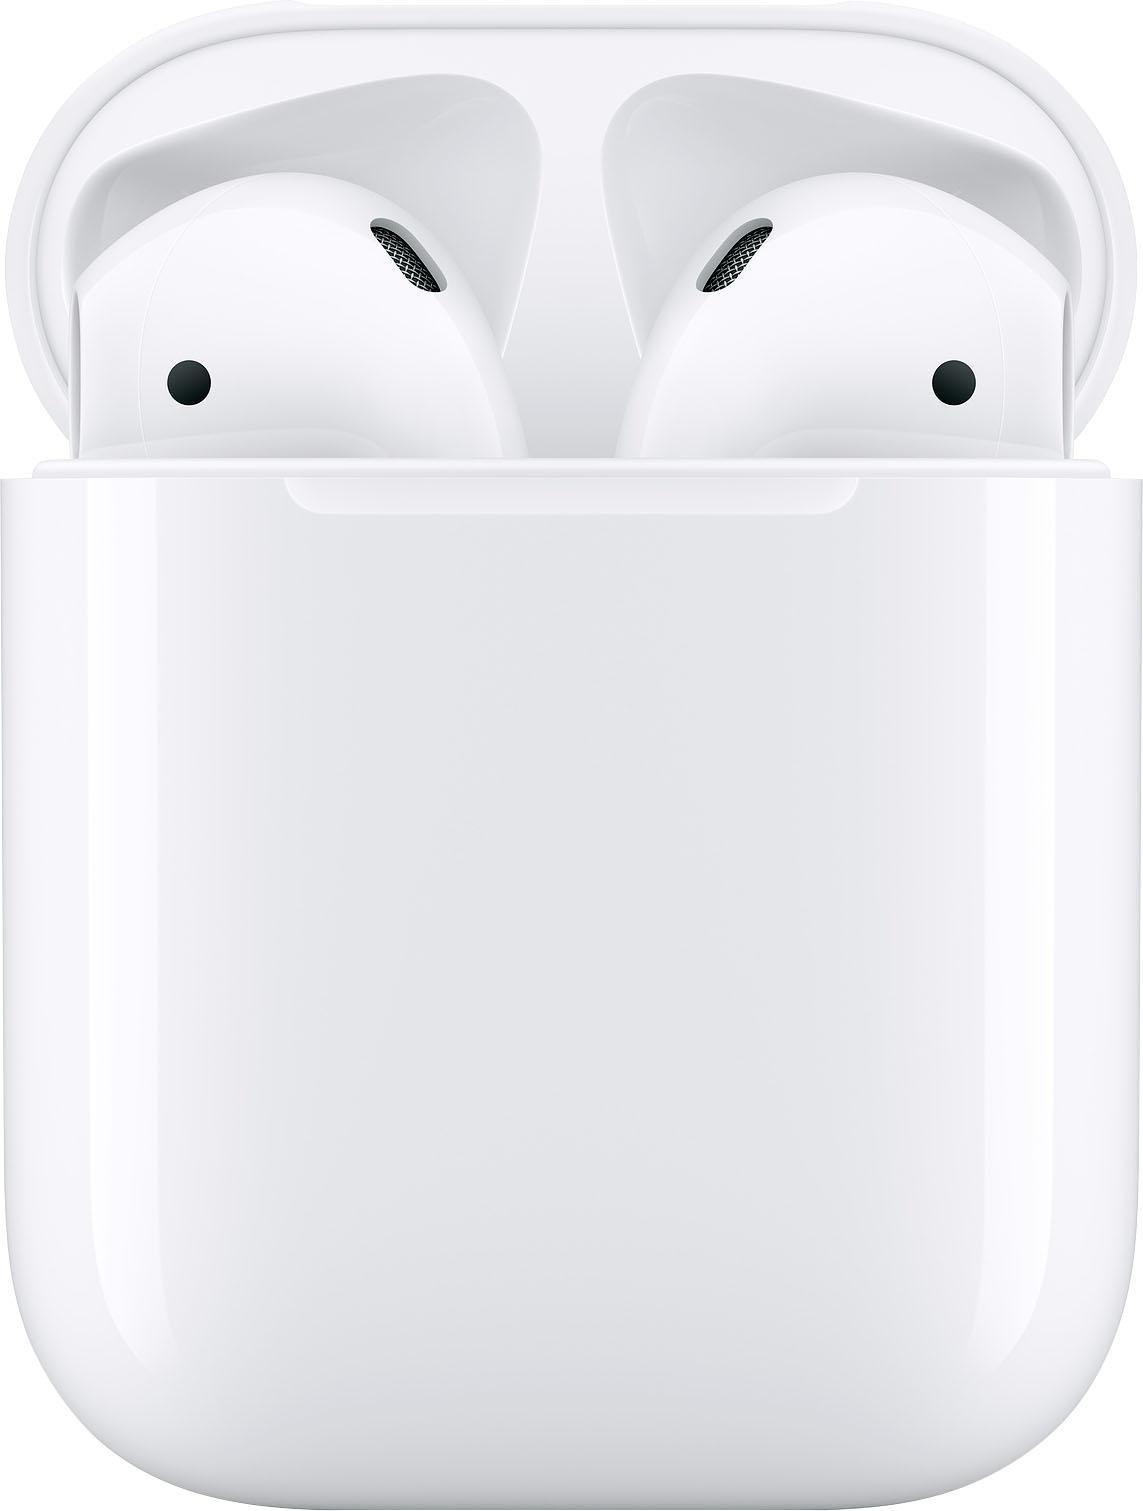 Apple »AirPods met Charging Case 2019« in-ear-hoofdtelefoon (bluetooth, spraakbesturing) - gratis ruilen op otto.nl